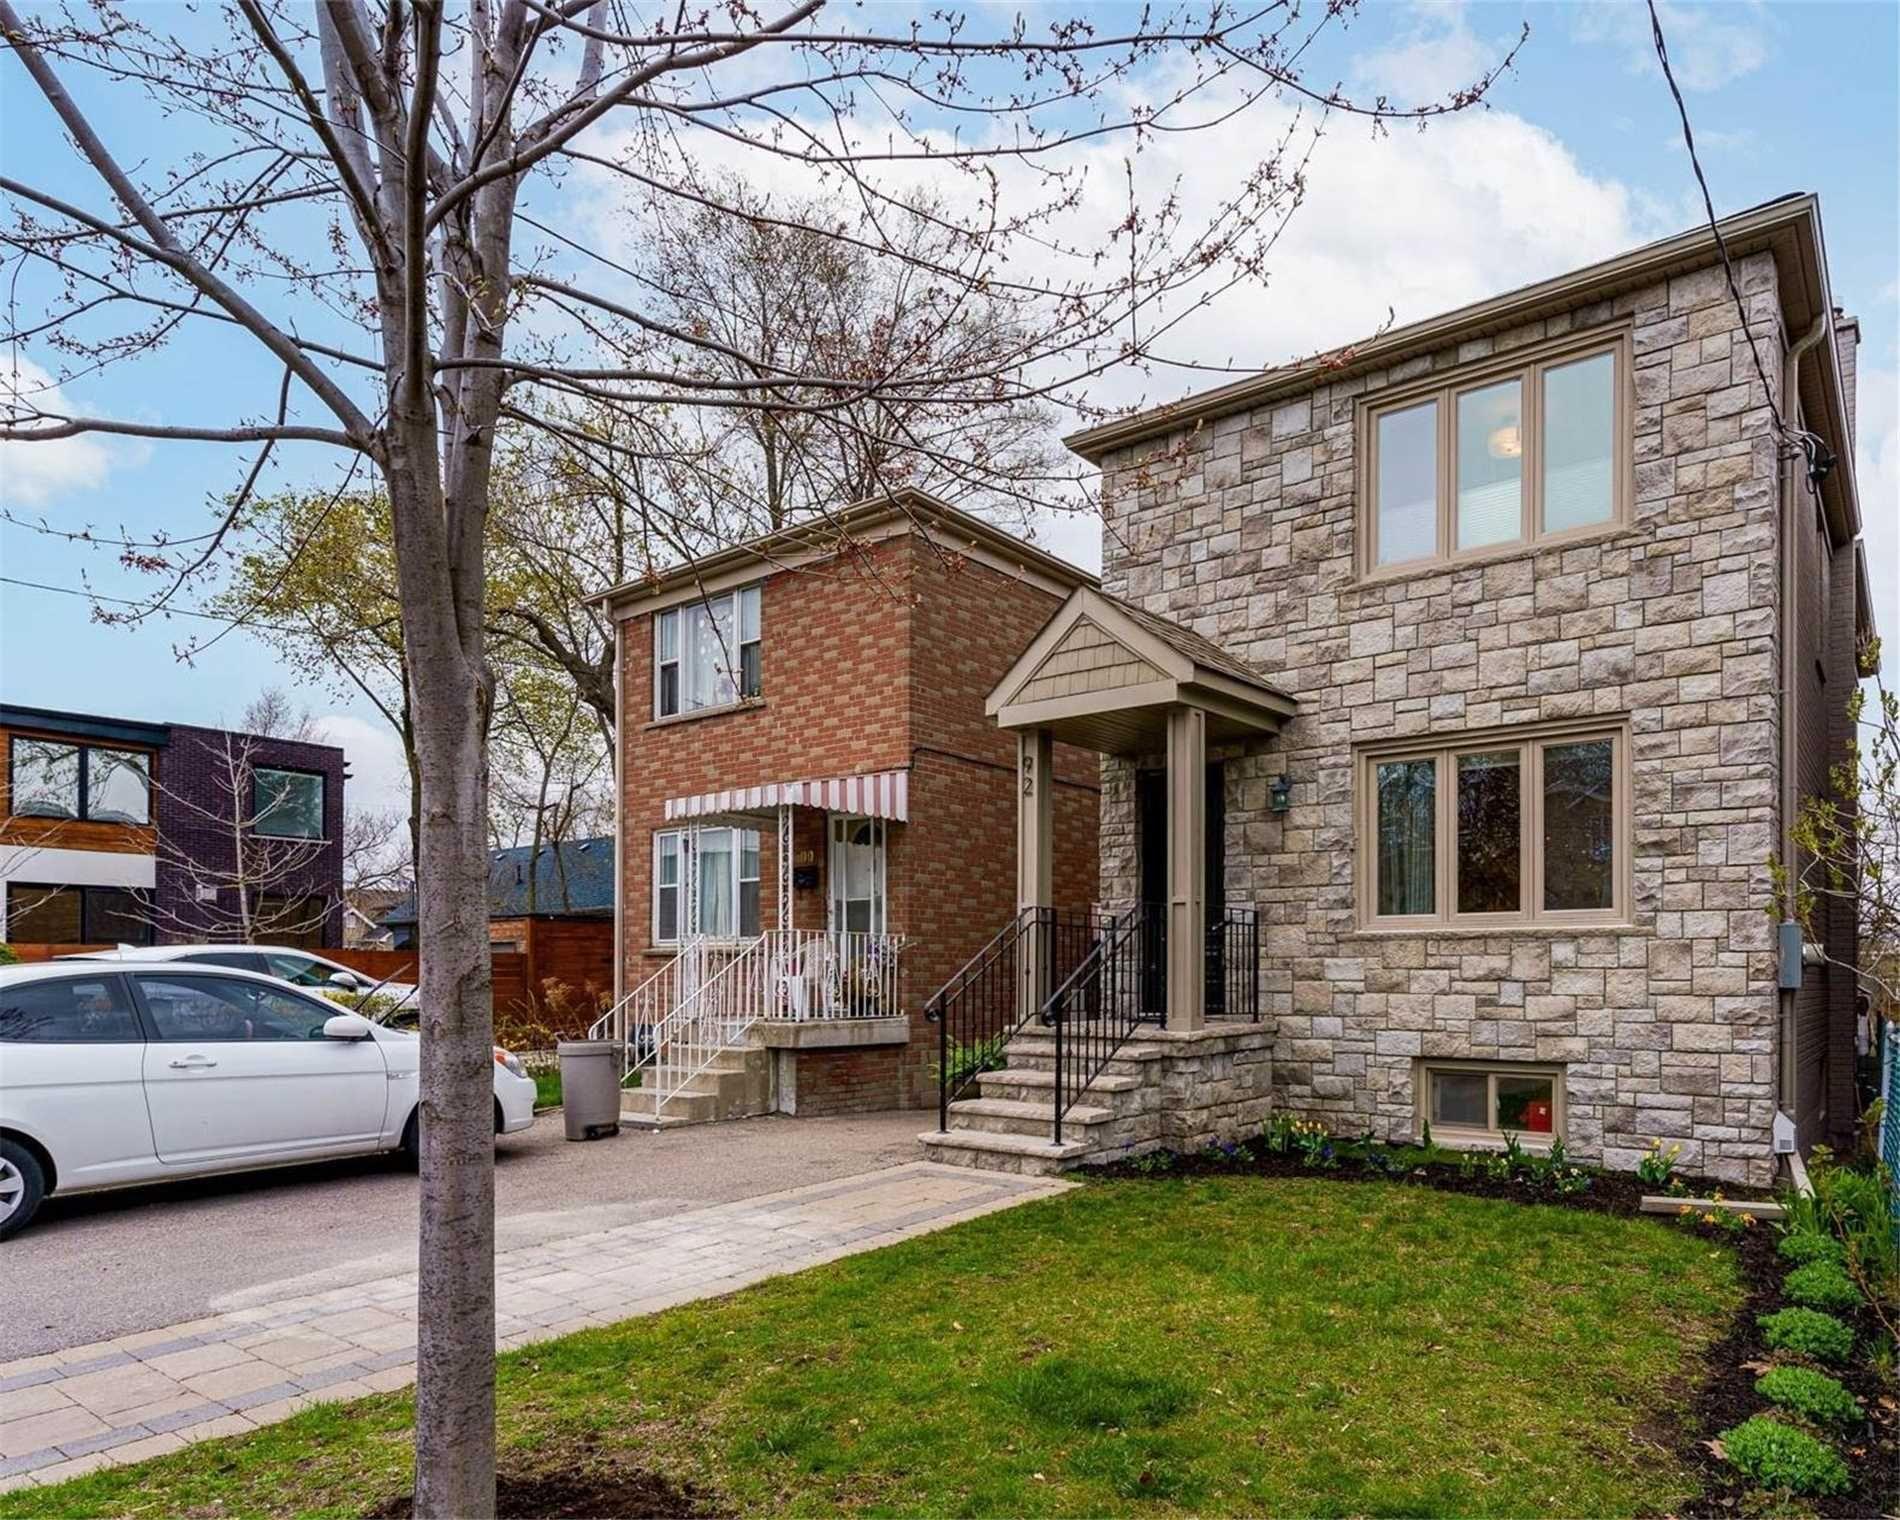 Photo 39: Photos: 92 Holborne Avenue in Toronto: Danforth Village-East York House (2-Storey) for sale (Toronto E03)  : MLS®# E5204452